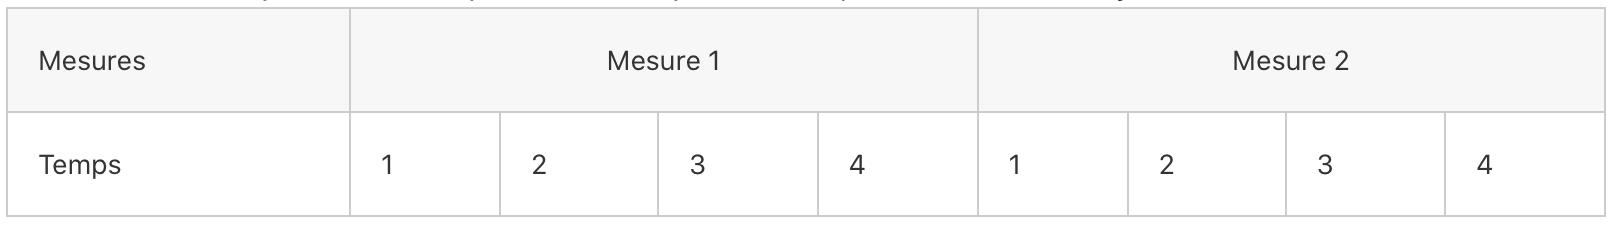 correspondance mesure temps rythme binaire